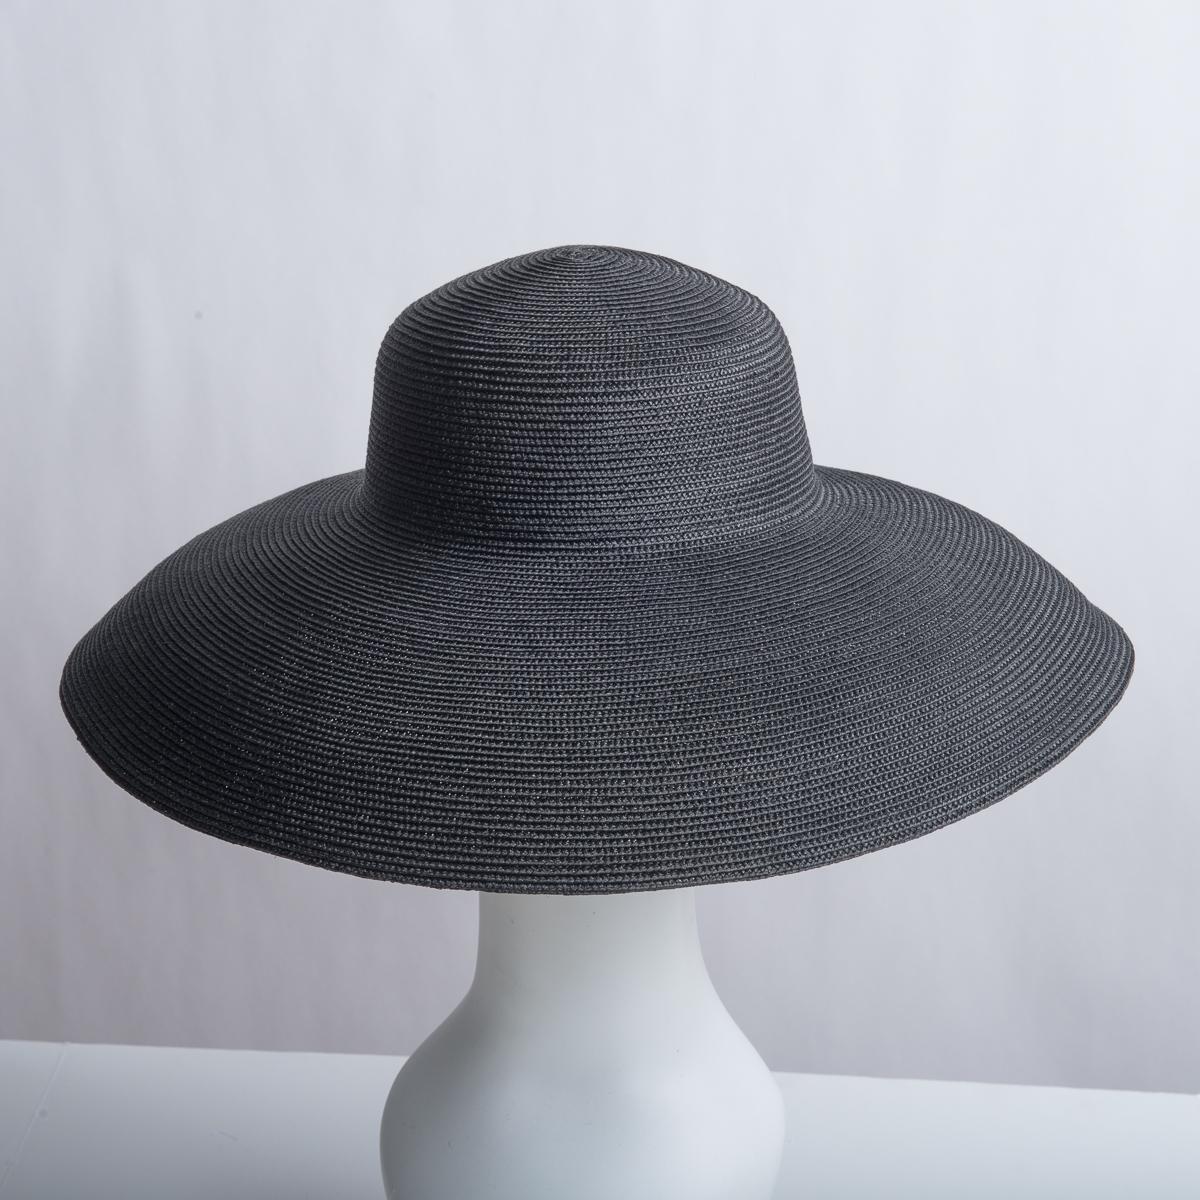 96de5f9d1e457b Black Dull Polypropylene Straw Wide Brim Plain Hats-Y108_88R-05- Sun Yorkos  | Zoria